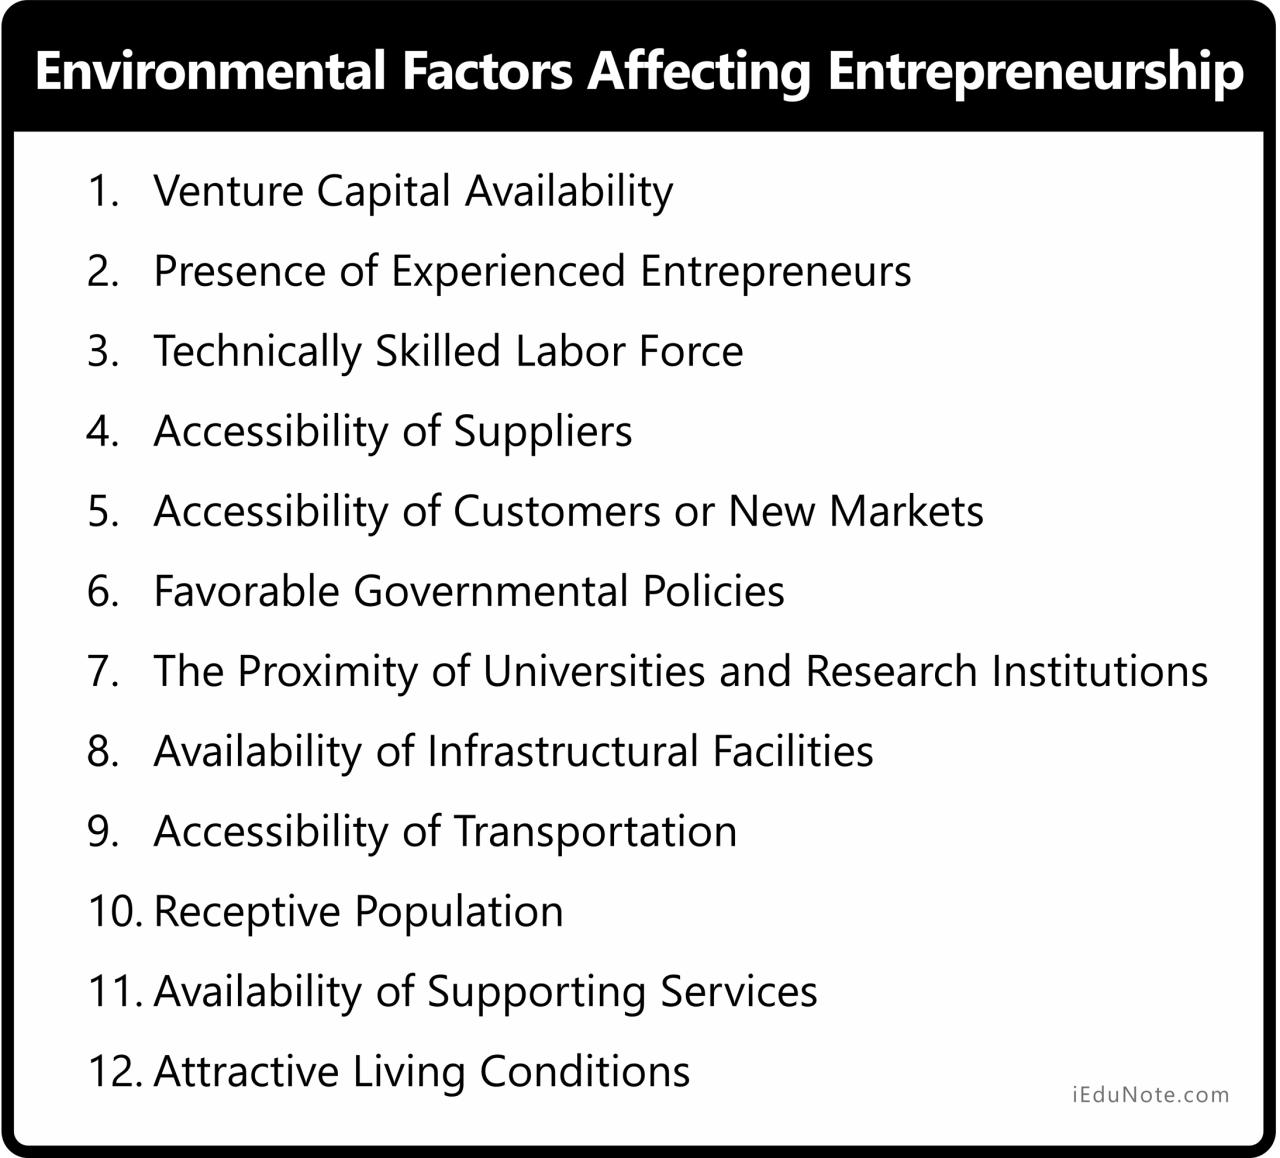 Factors of Environment that Affect Entrepreneurship